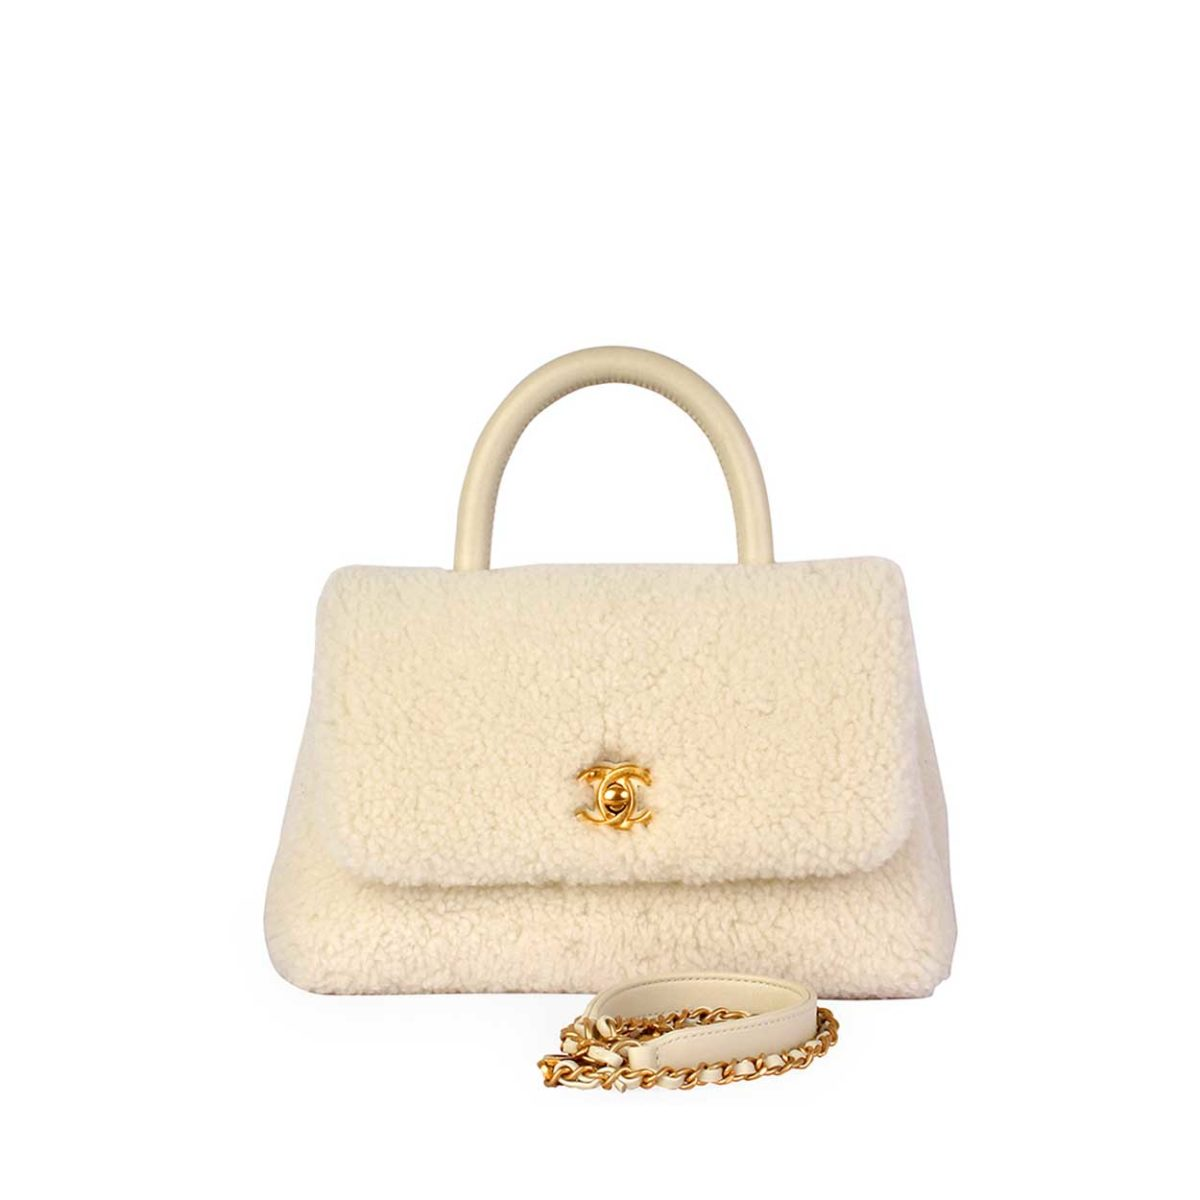 7df2f5e084a8 CHANEL Shearling Sheepskin Coco Handle Bag White - NEW   Luxity